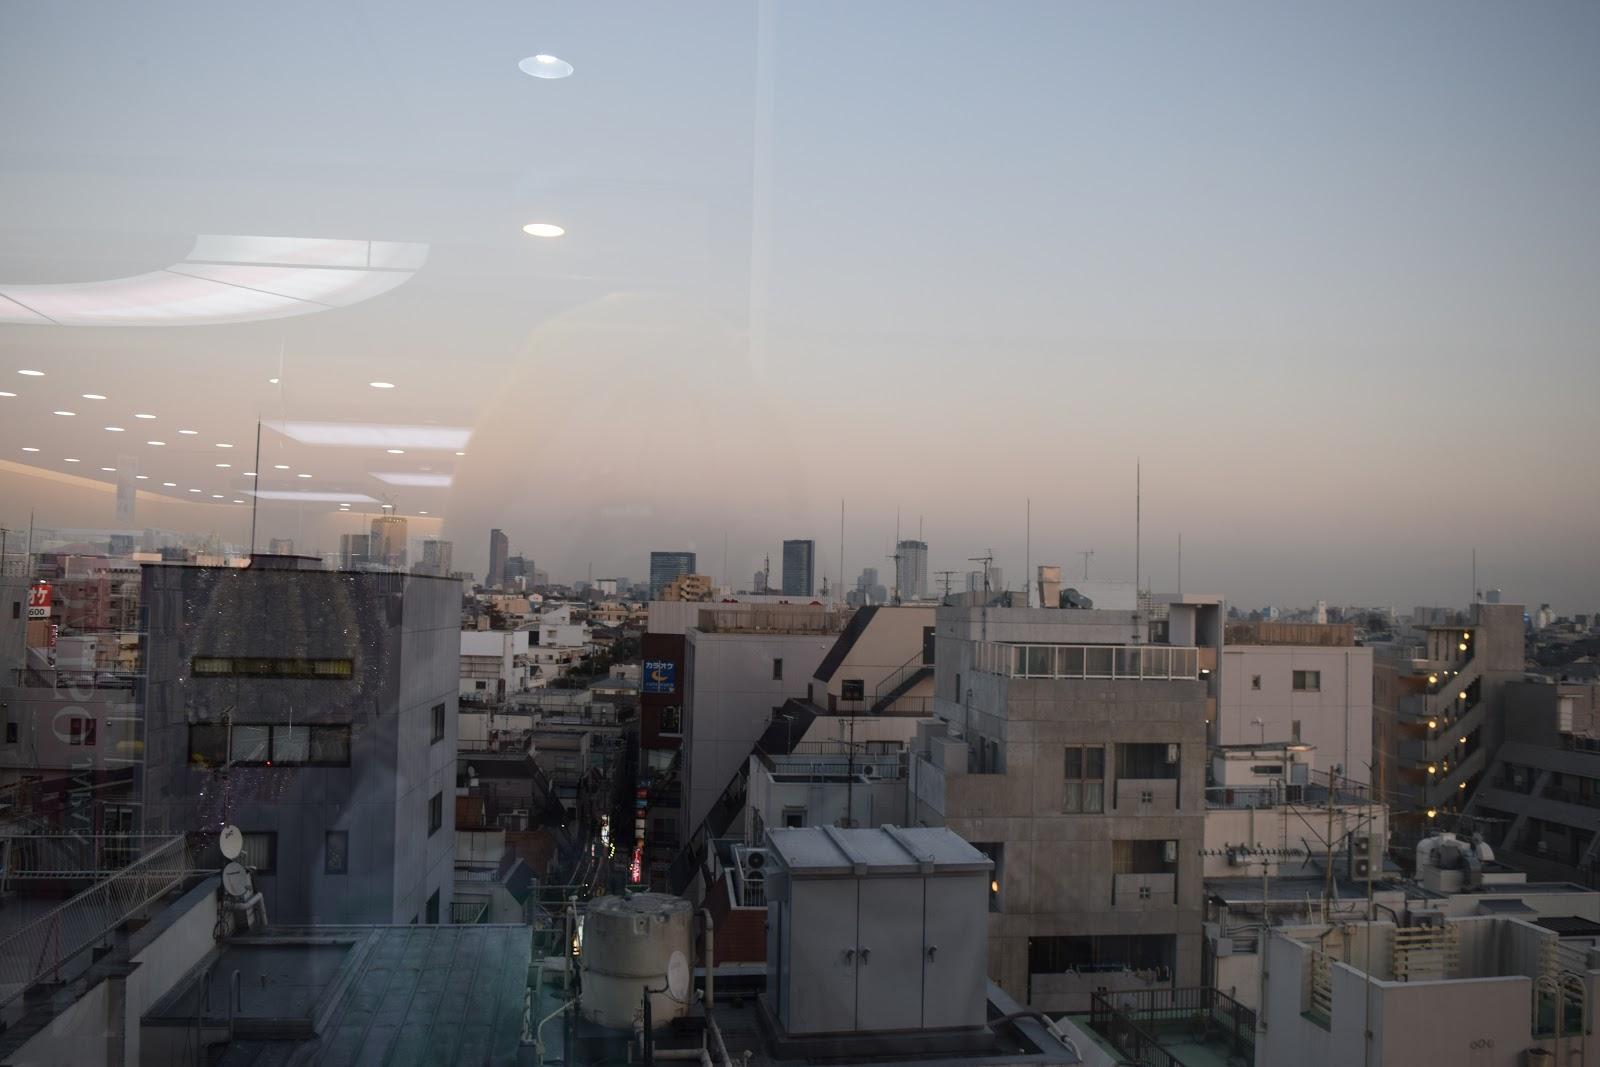 Tokyo skyline as seen from the window of Daiso in Shimokitazawa